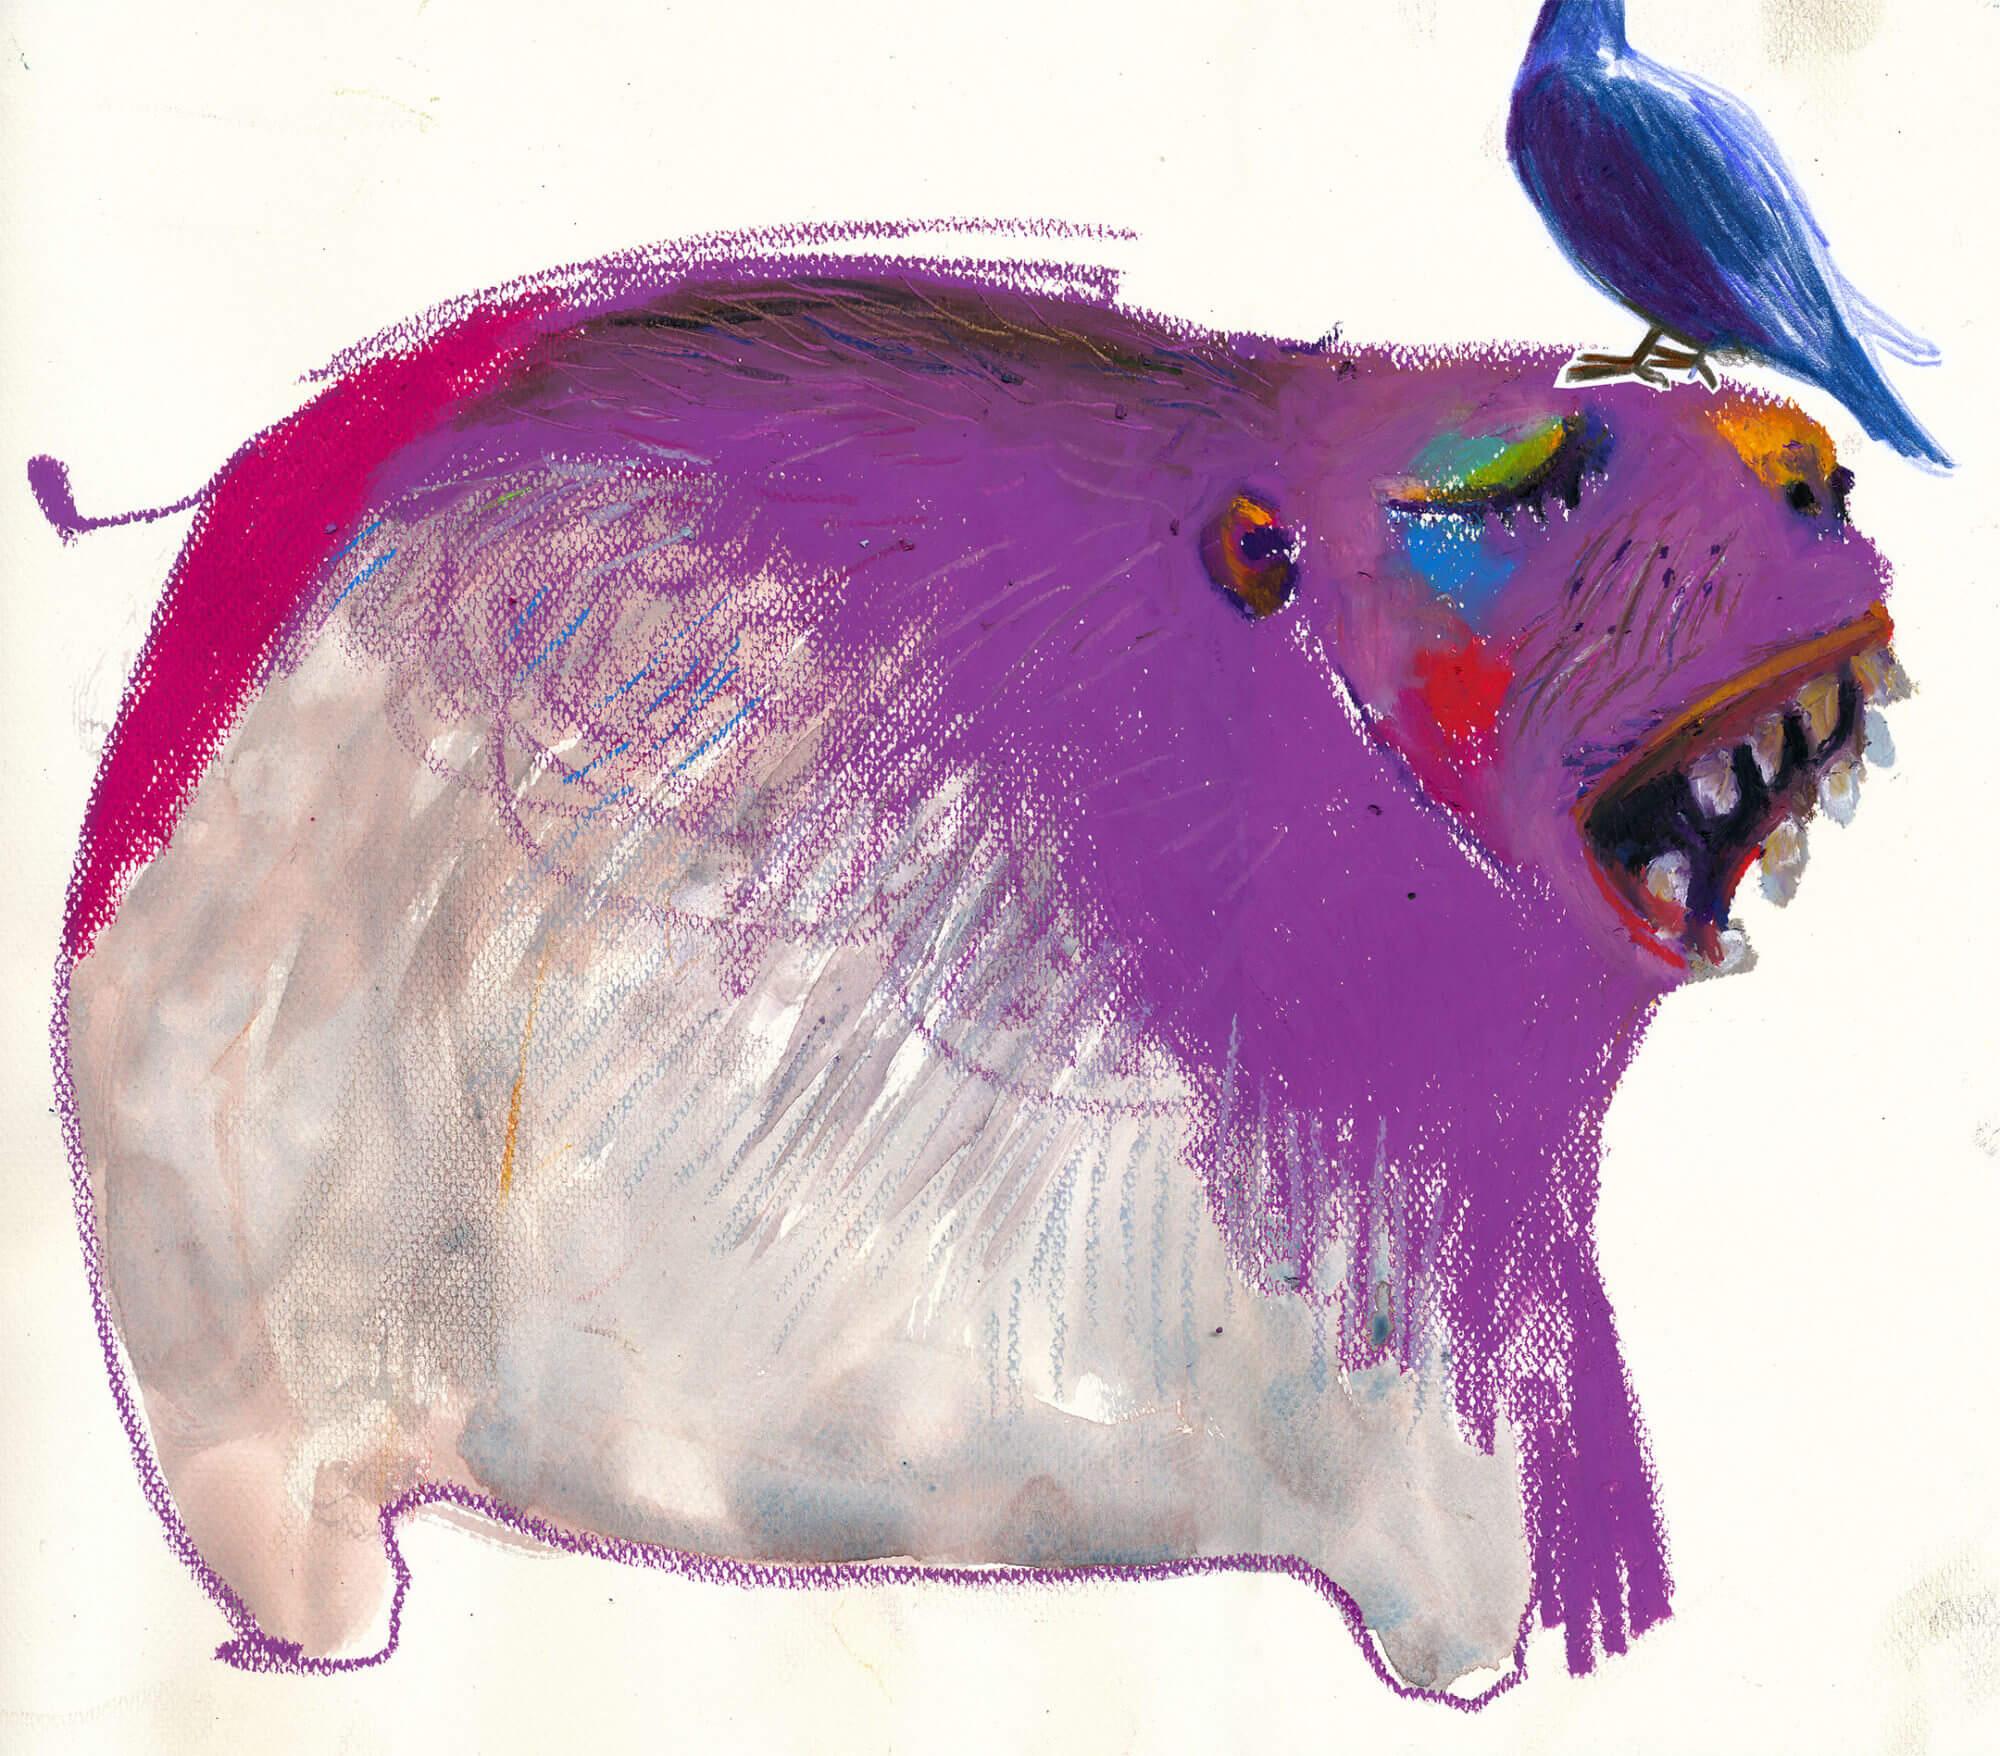 GUINEA PIGS I MET